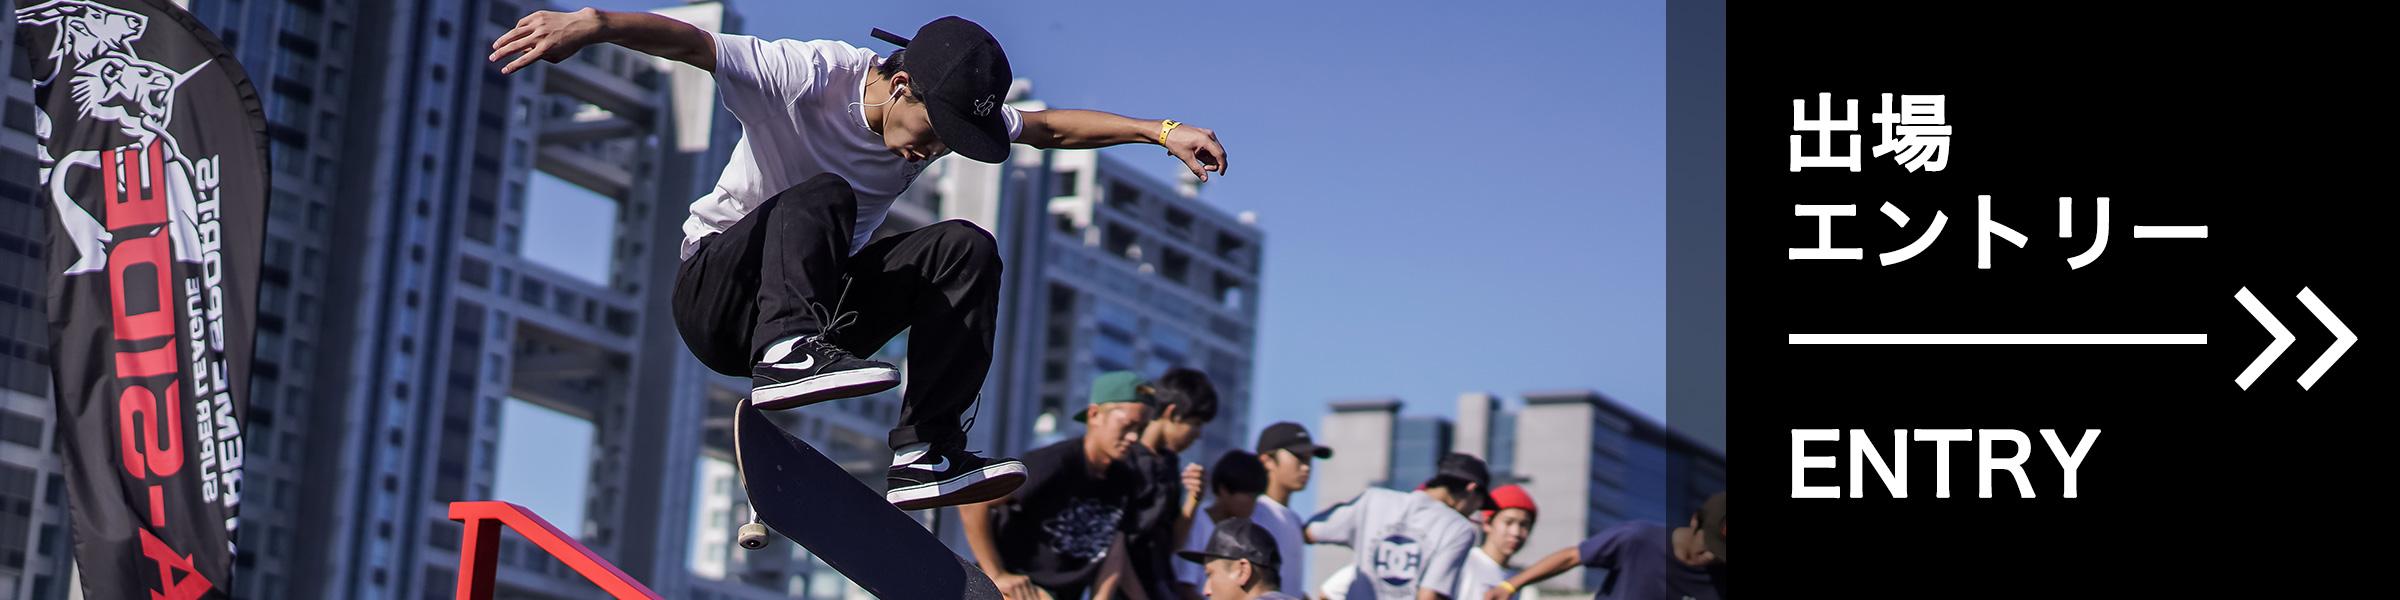 CHIMERA-A-SIDE2019のENTRYページ画像:Skateboard スケートボード